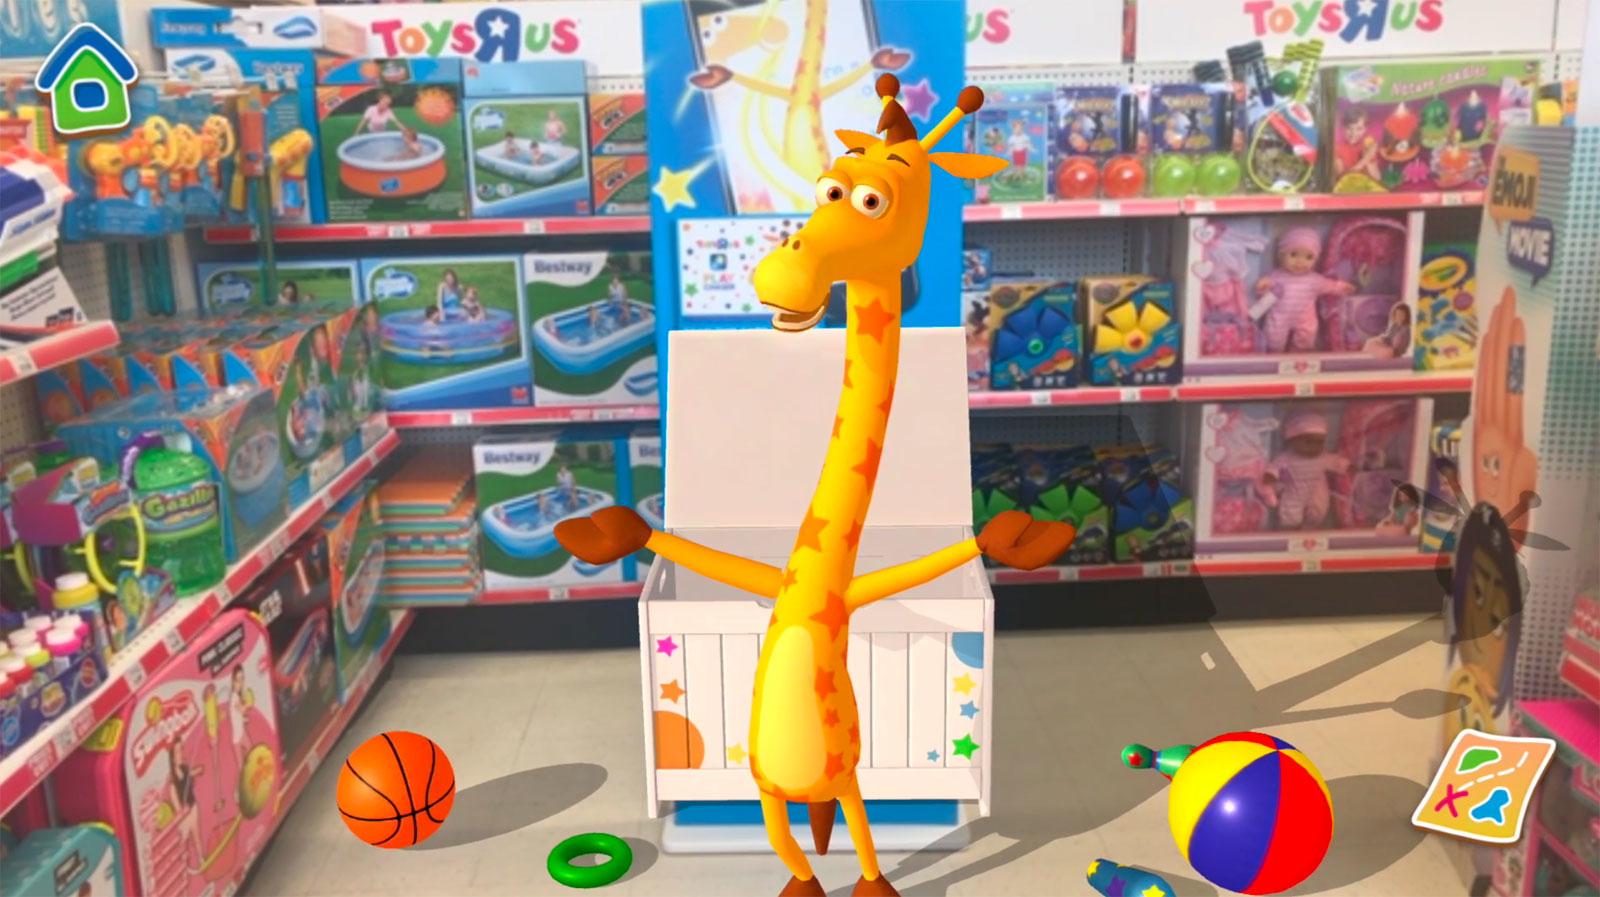 Toys Are Us Search : 玩具反斗城想用「ar」吸引你回到门市重温欢乐时光